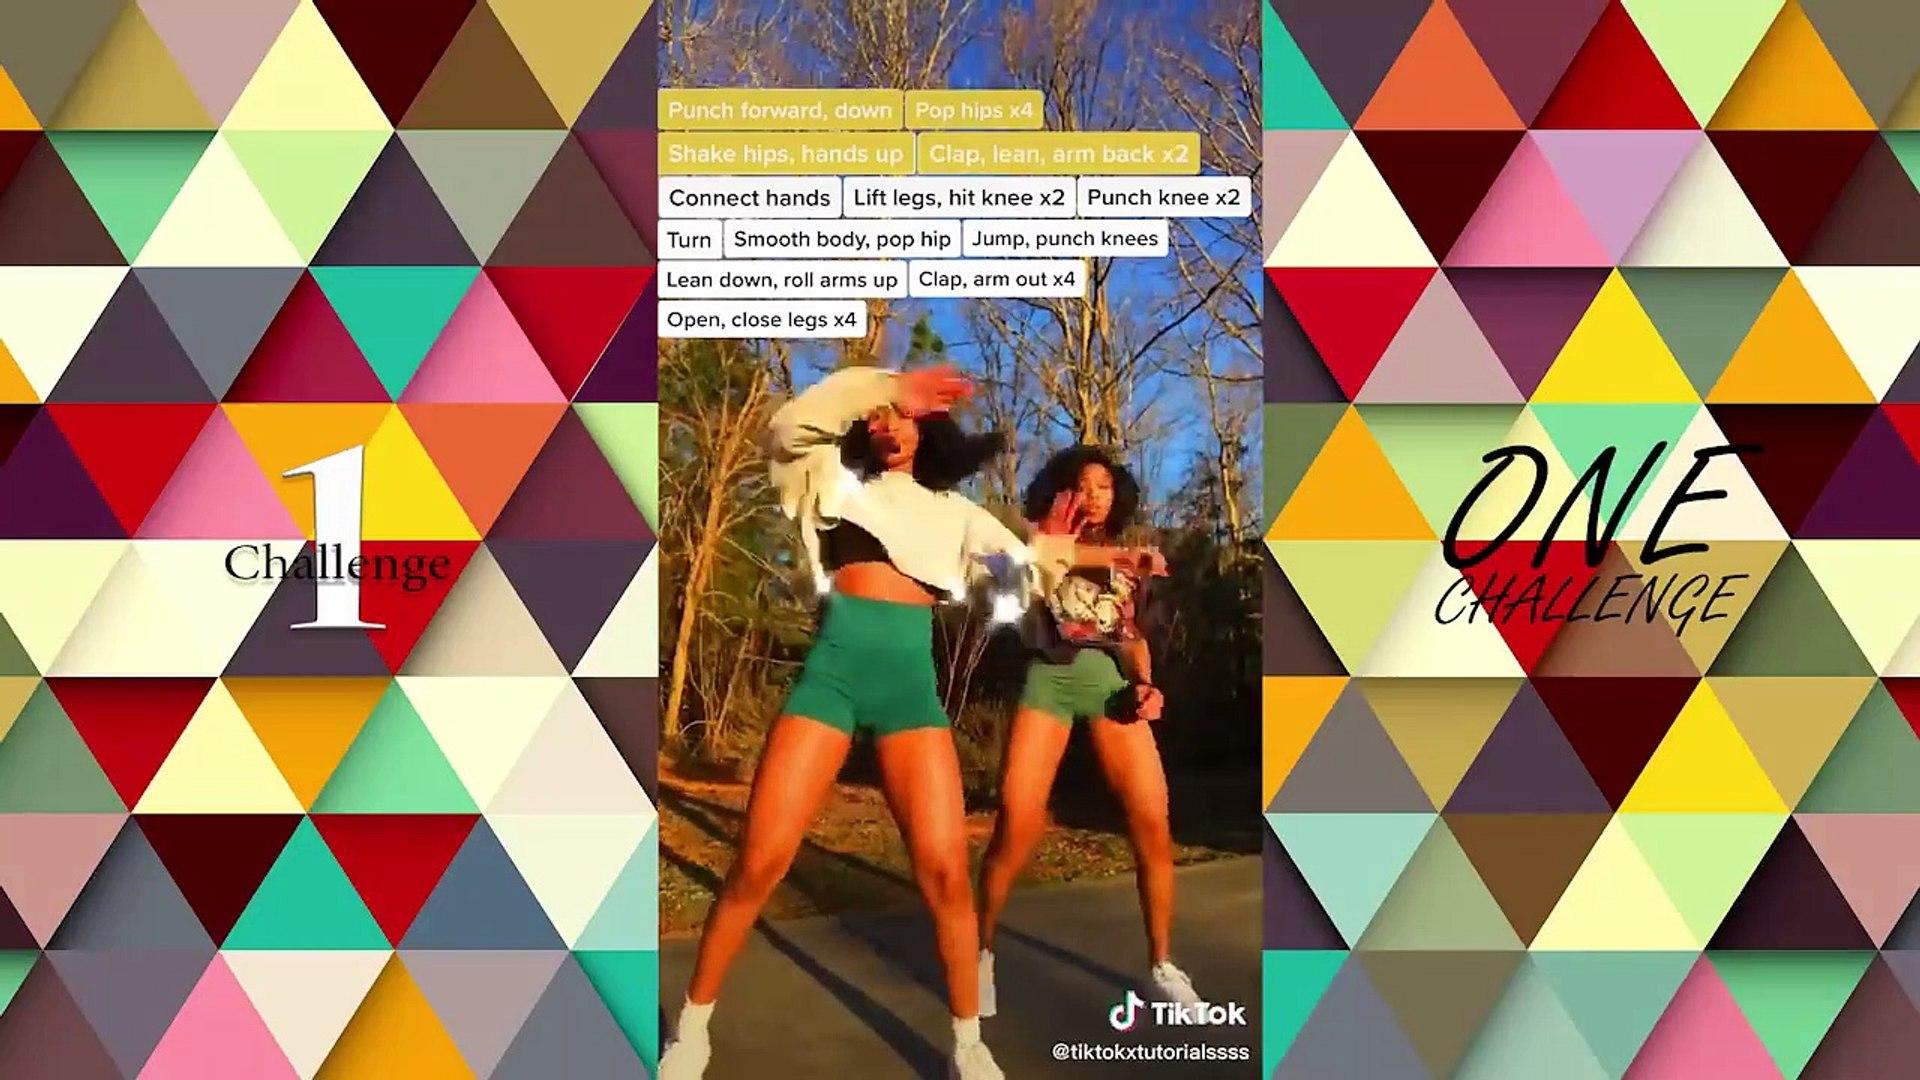 Best Tik Tok Music 2021  Tik Tok Songs 2021  Tik Tok Playlist 2021 - Tiktok Hits 2021 Collection